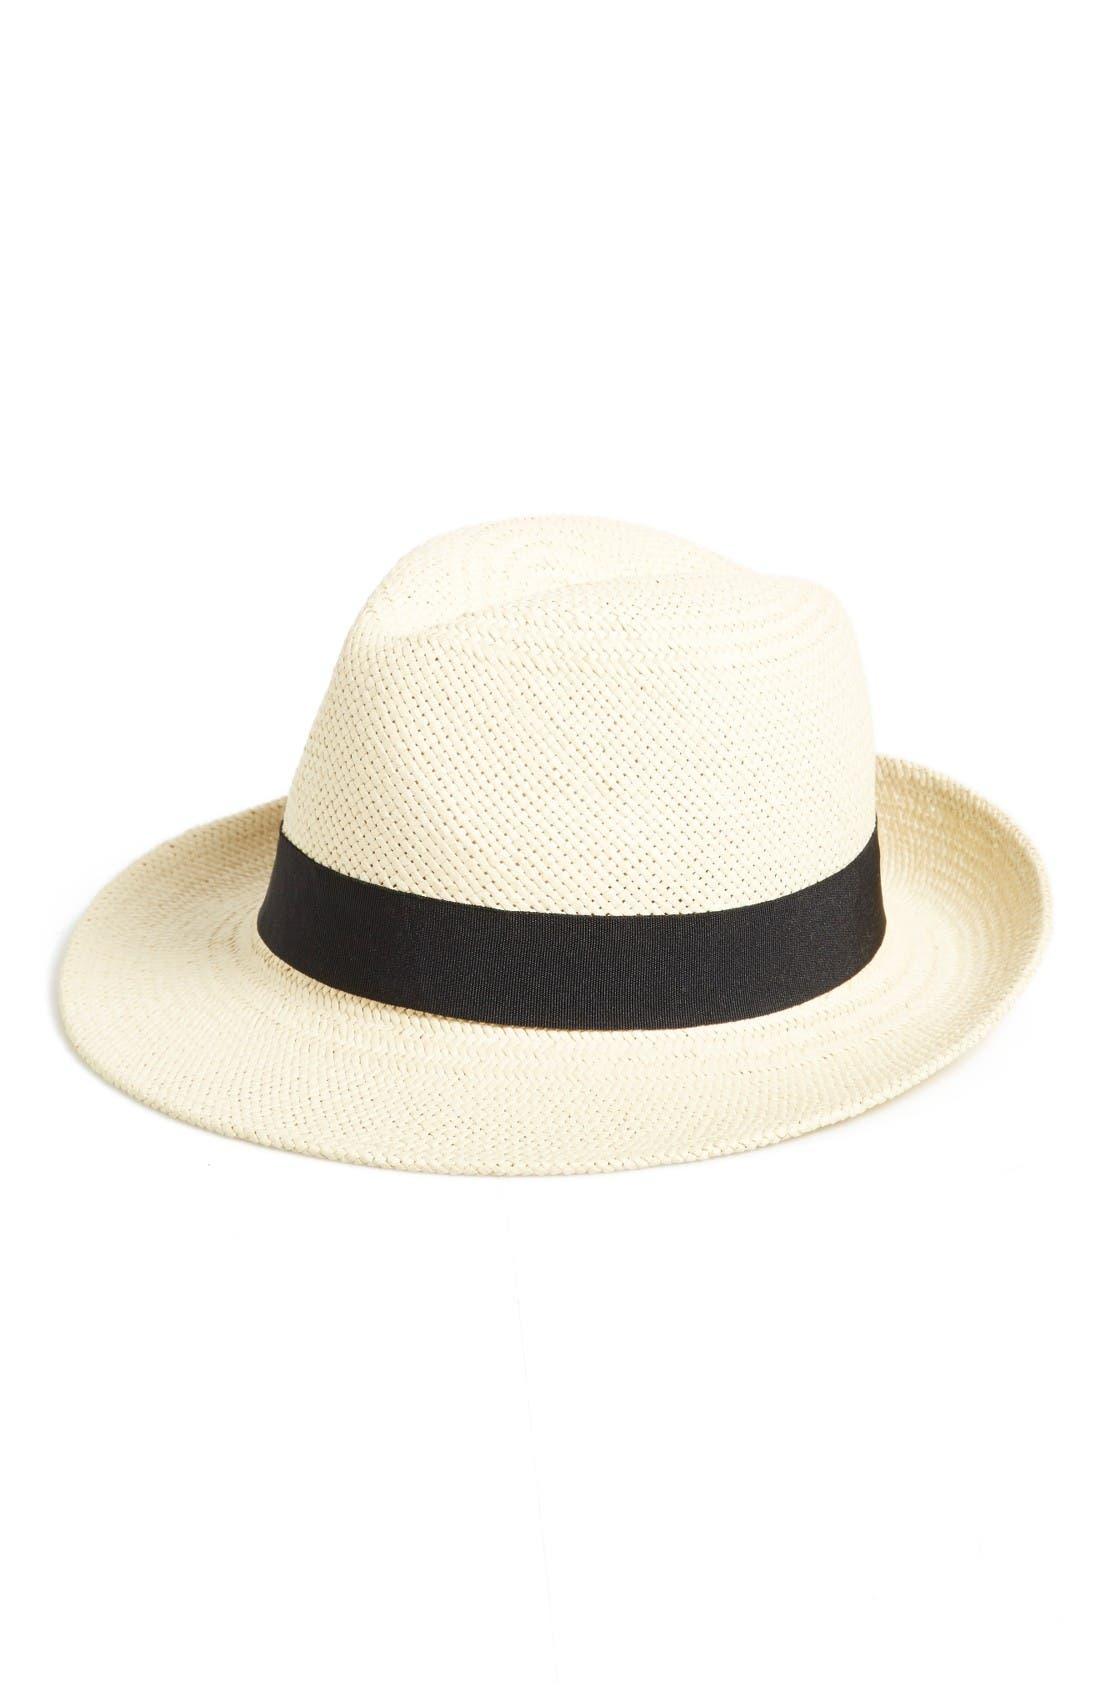 Alternate Image 1 Selected - Halogen® Straw Panama Hat